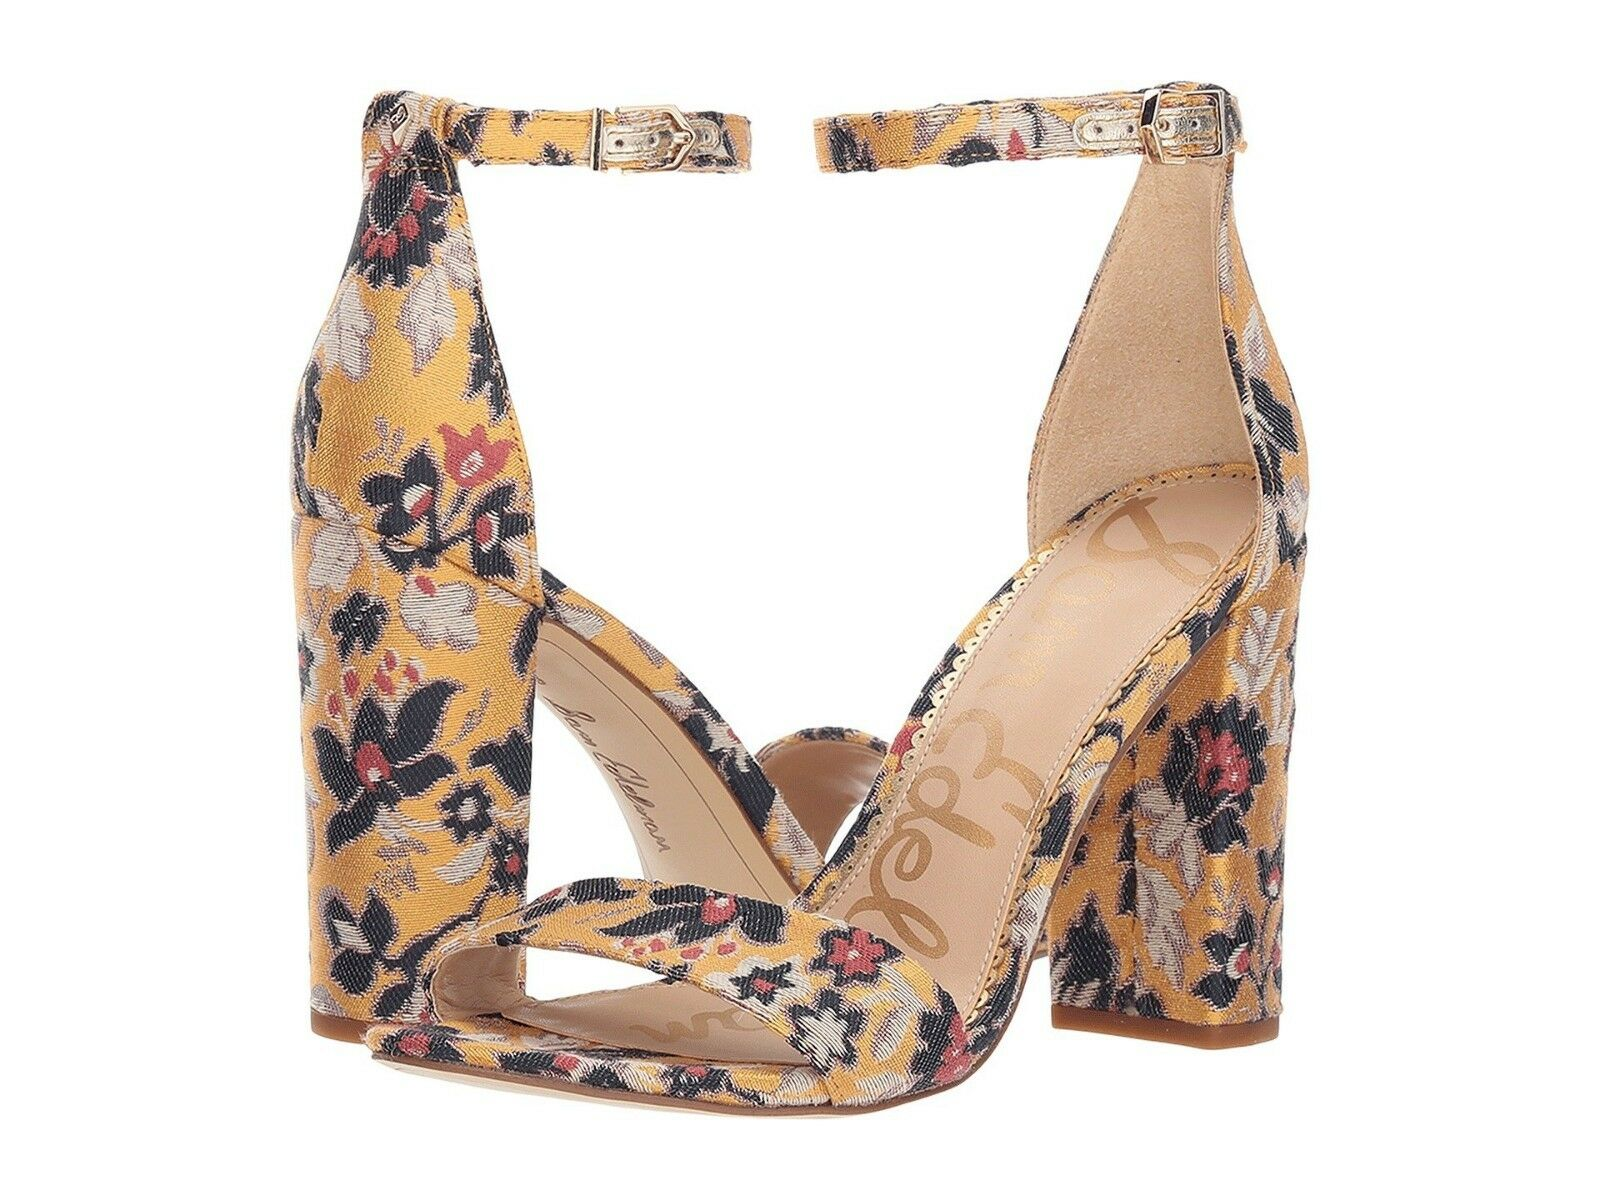 Sam Edelman Yaro Yellow Floral Jacquard Ankle Strap Block Heel Sandal NEW 7.5